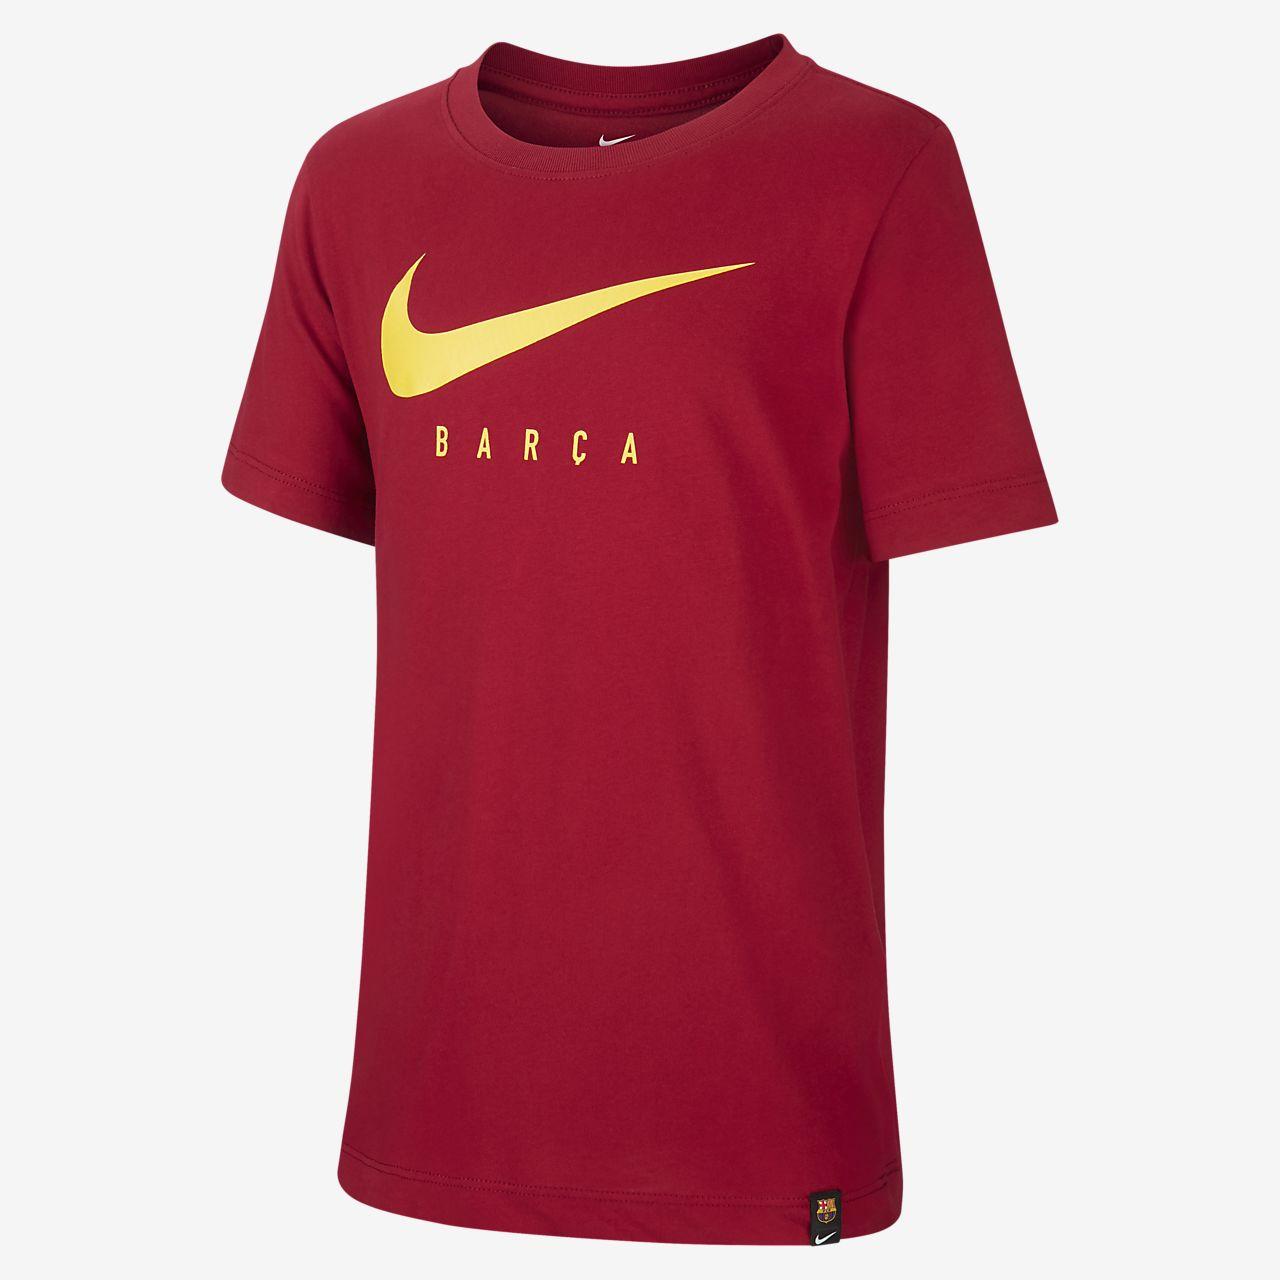 Nike Dri-FIT FC Barcelona Voetbalshirt voor kids